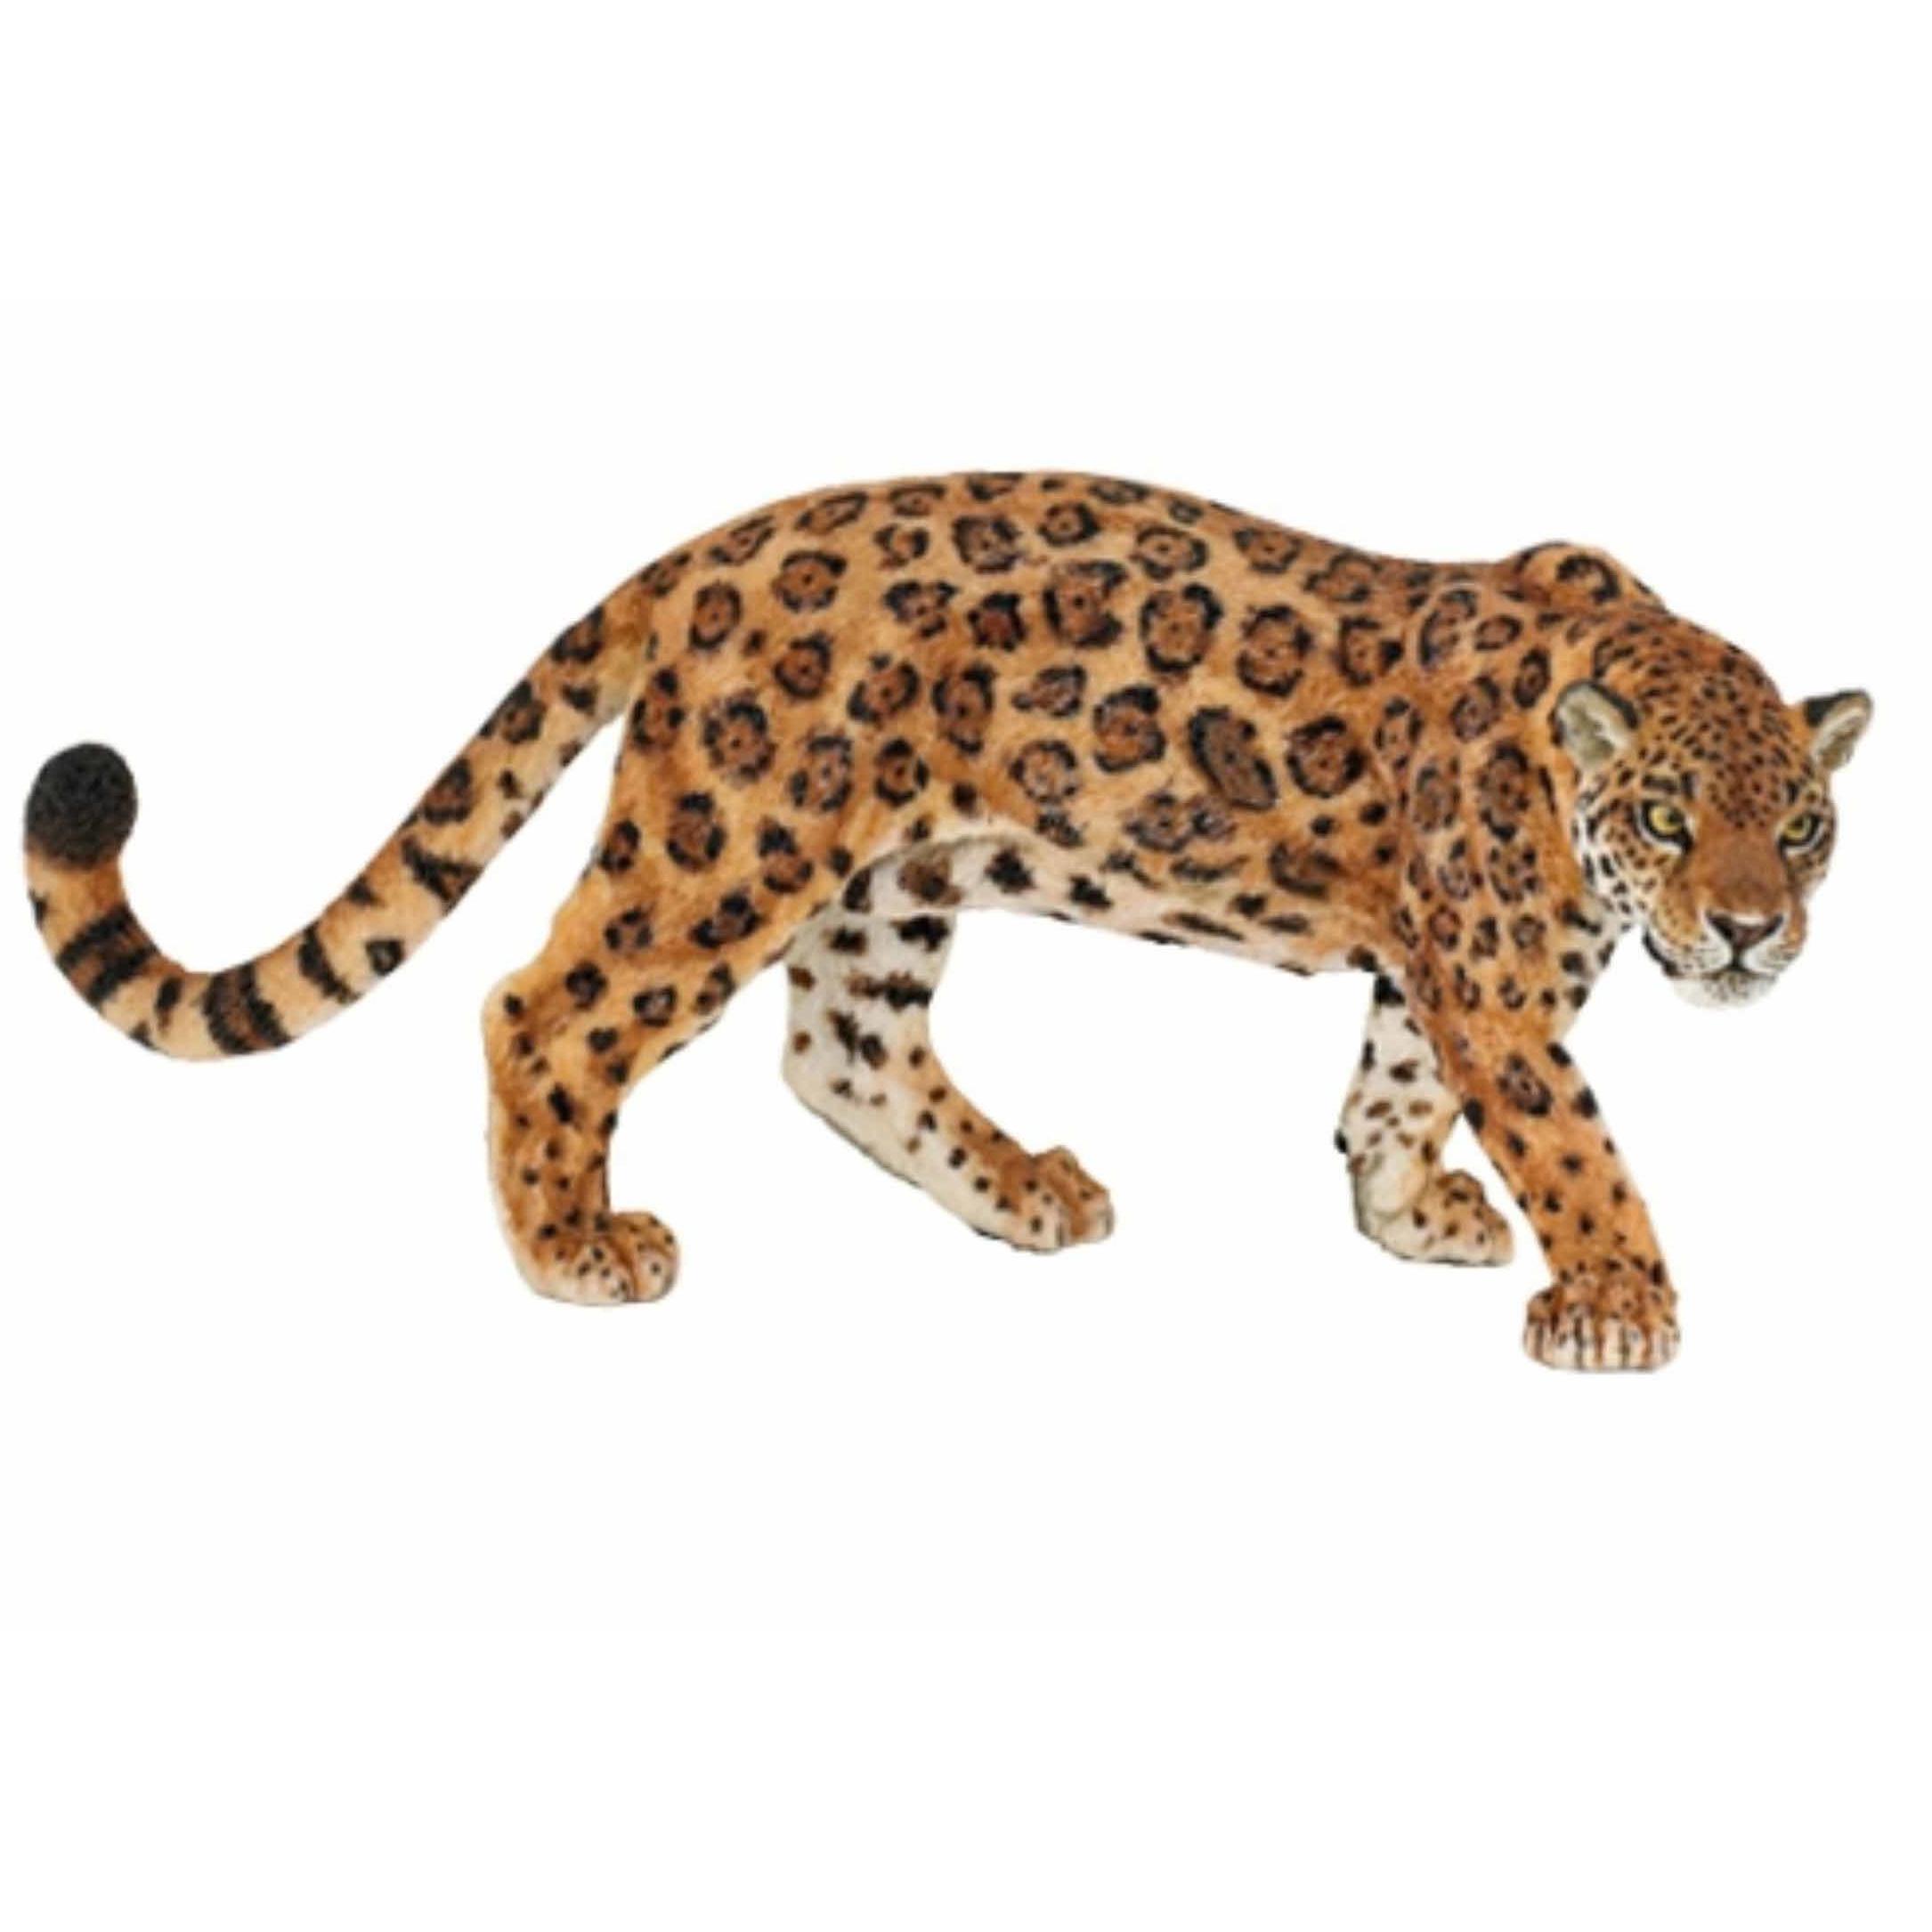 Image of Plastic jaguar 11 cm